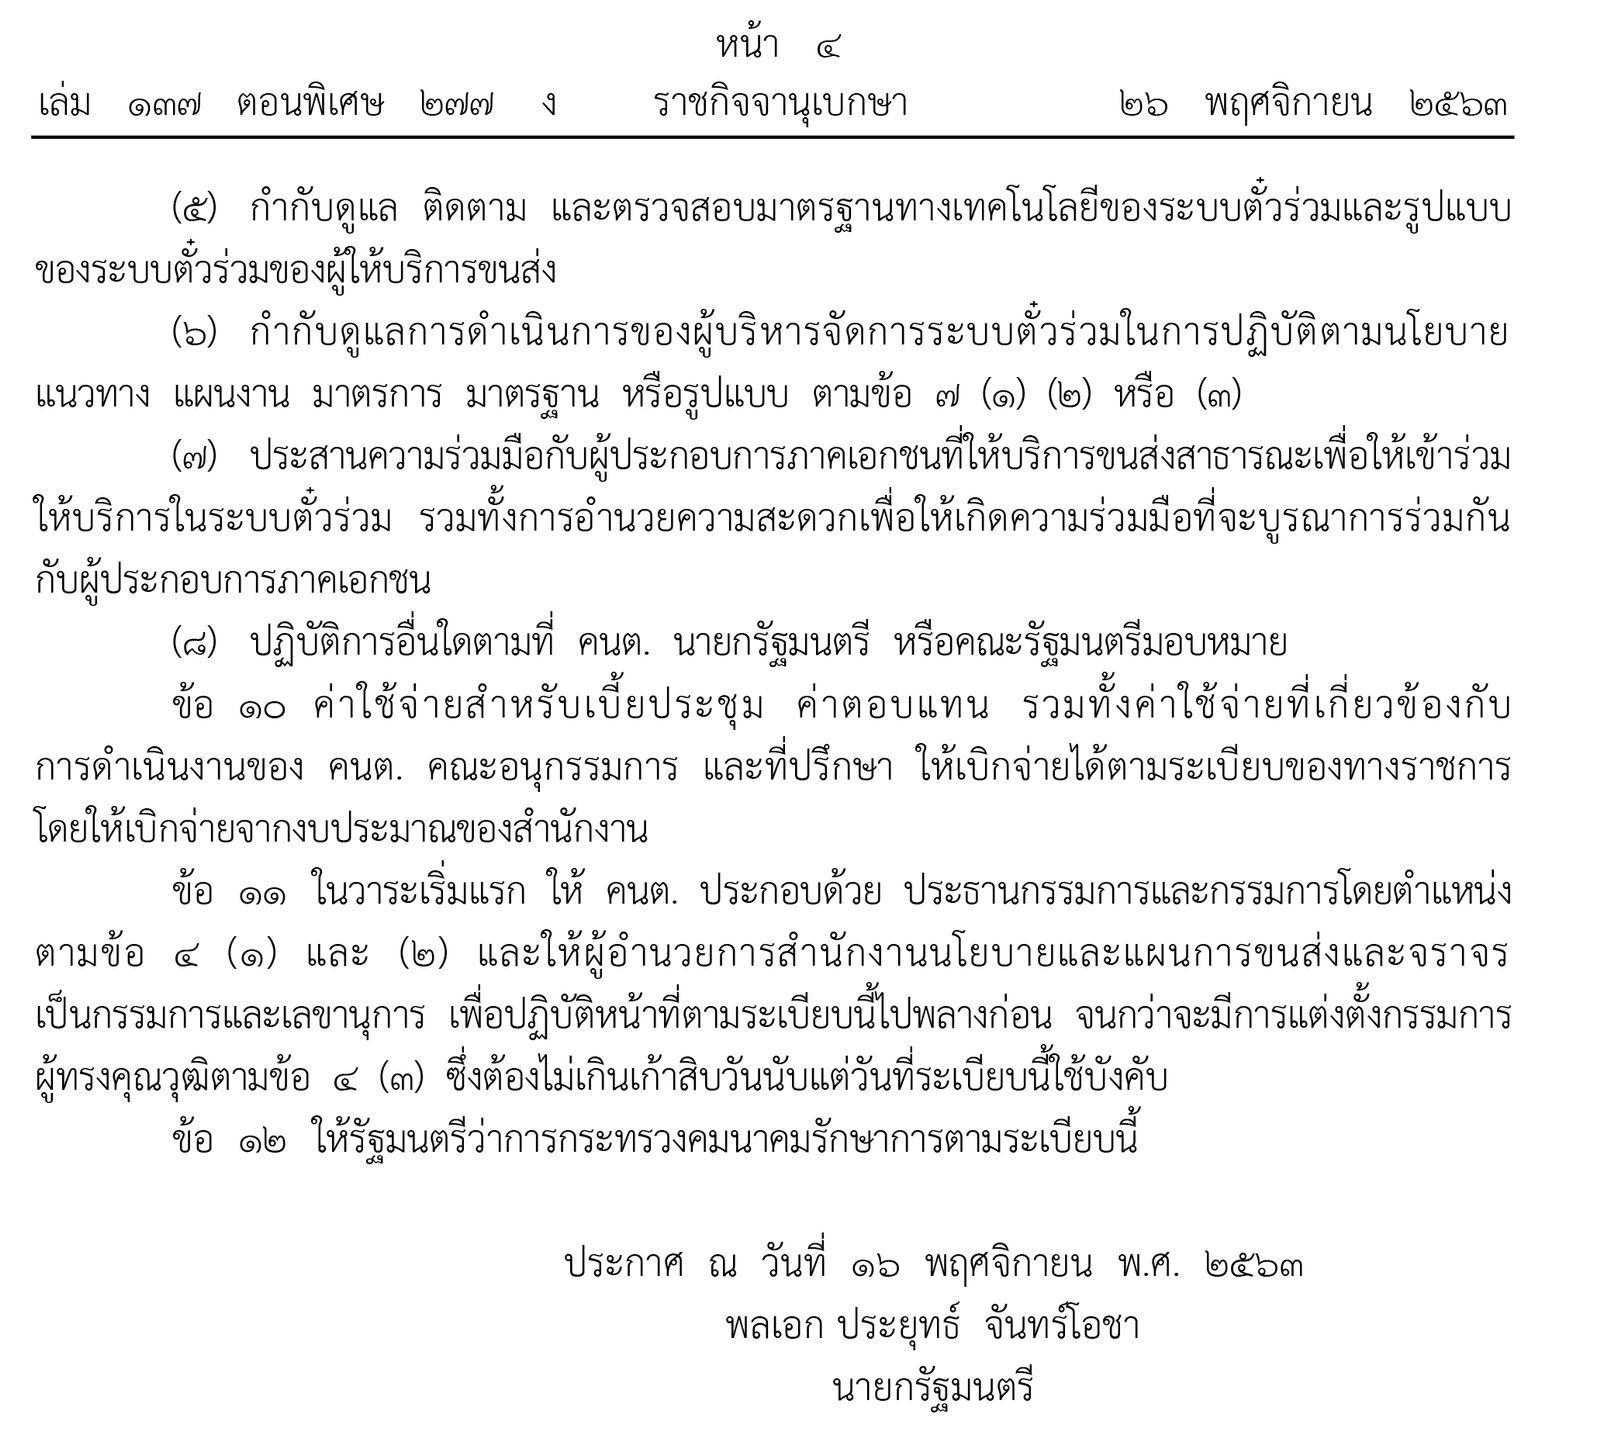 T_0001-4.jpg